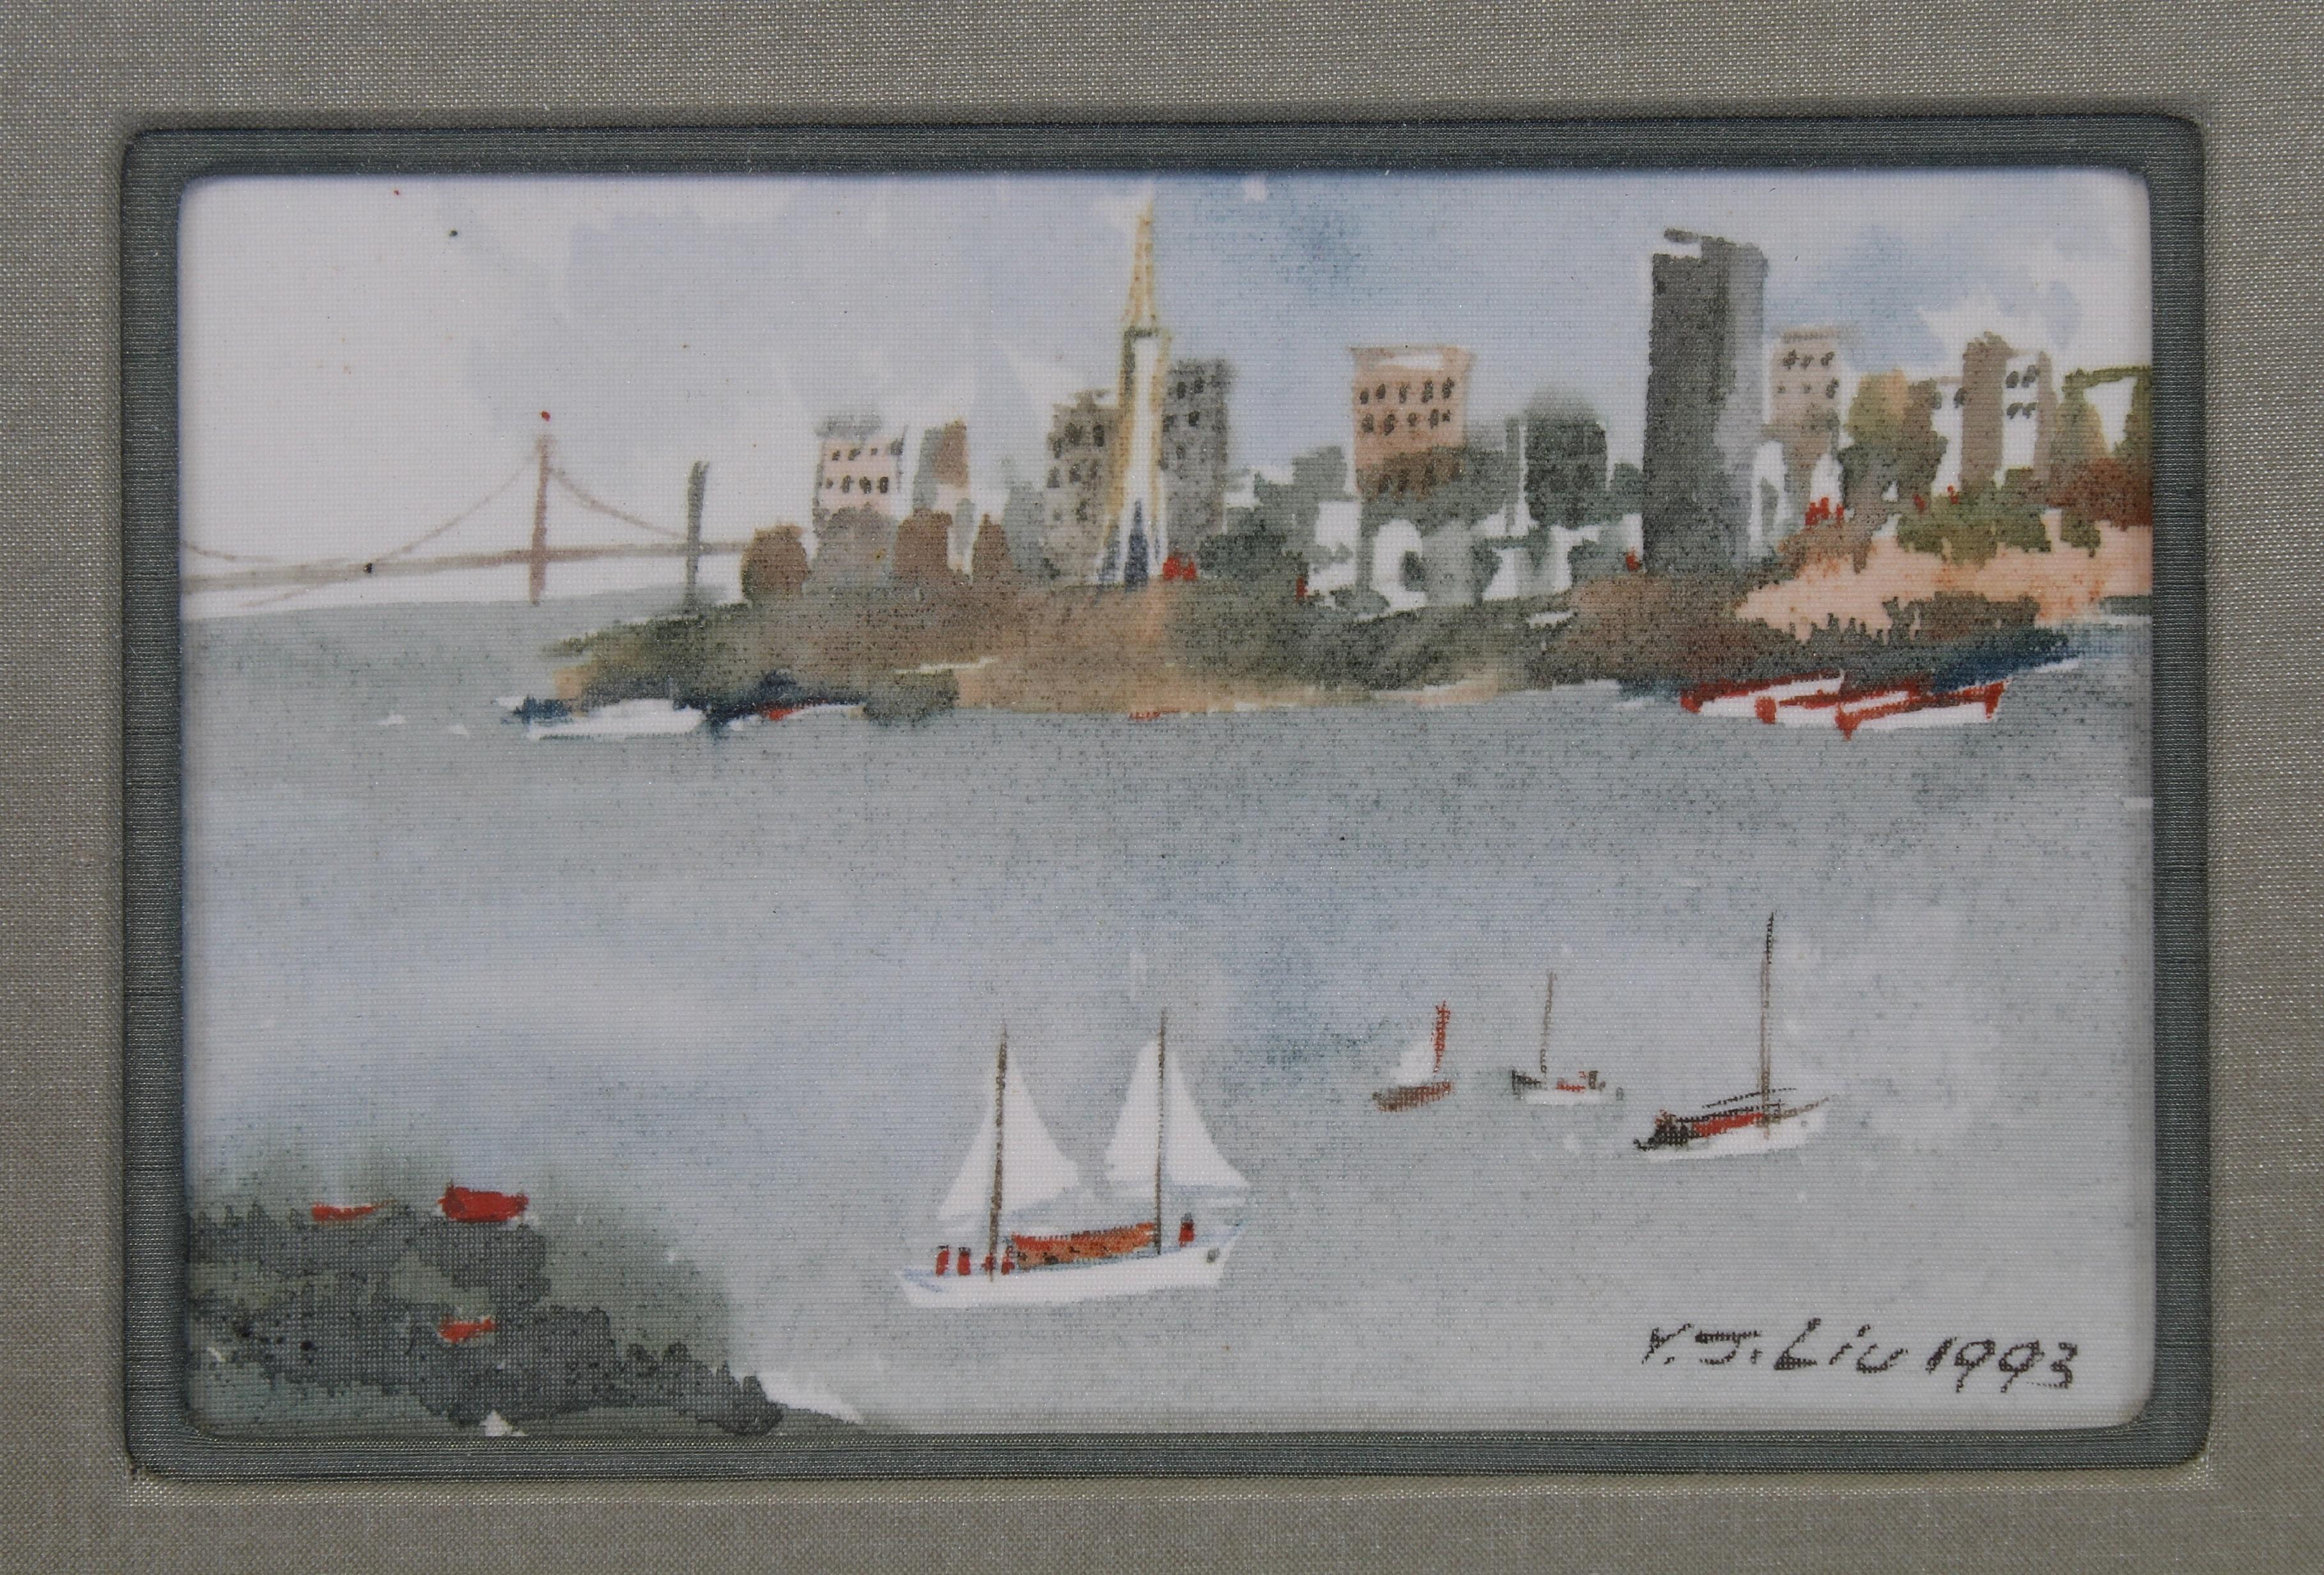 James Y.J. Liu (B. 1910) San Francisco - Image 3 of 4